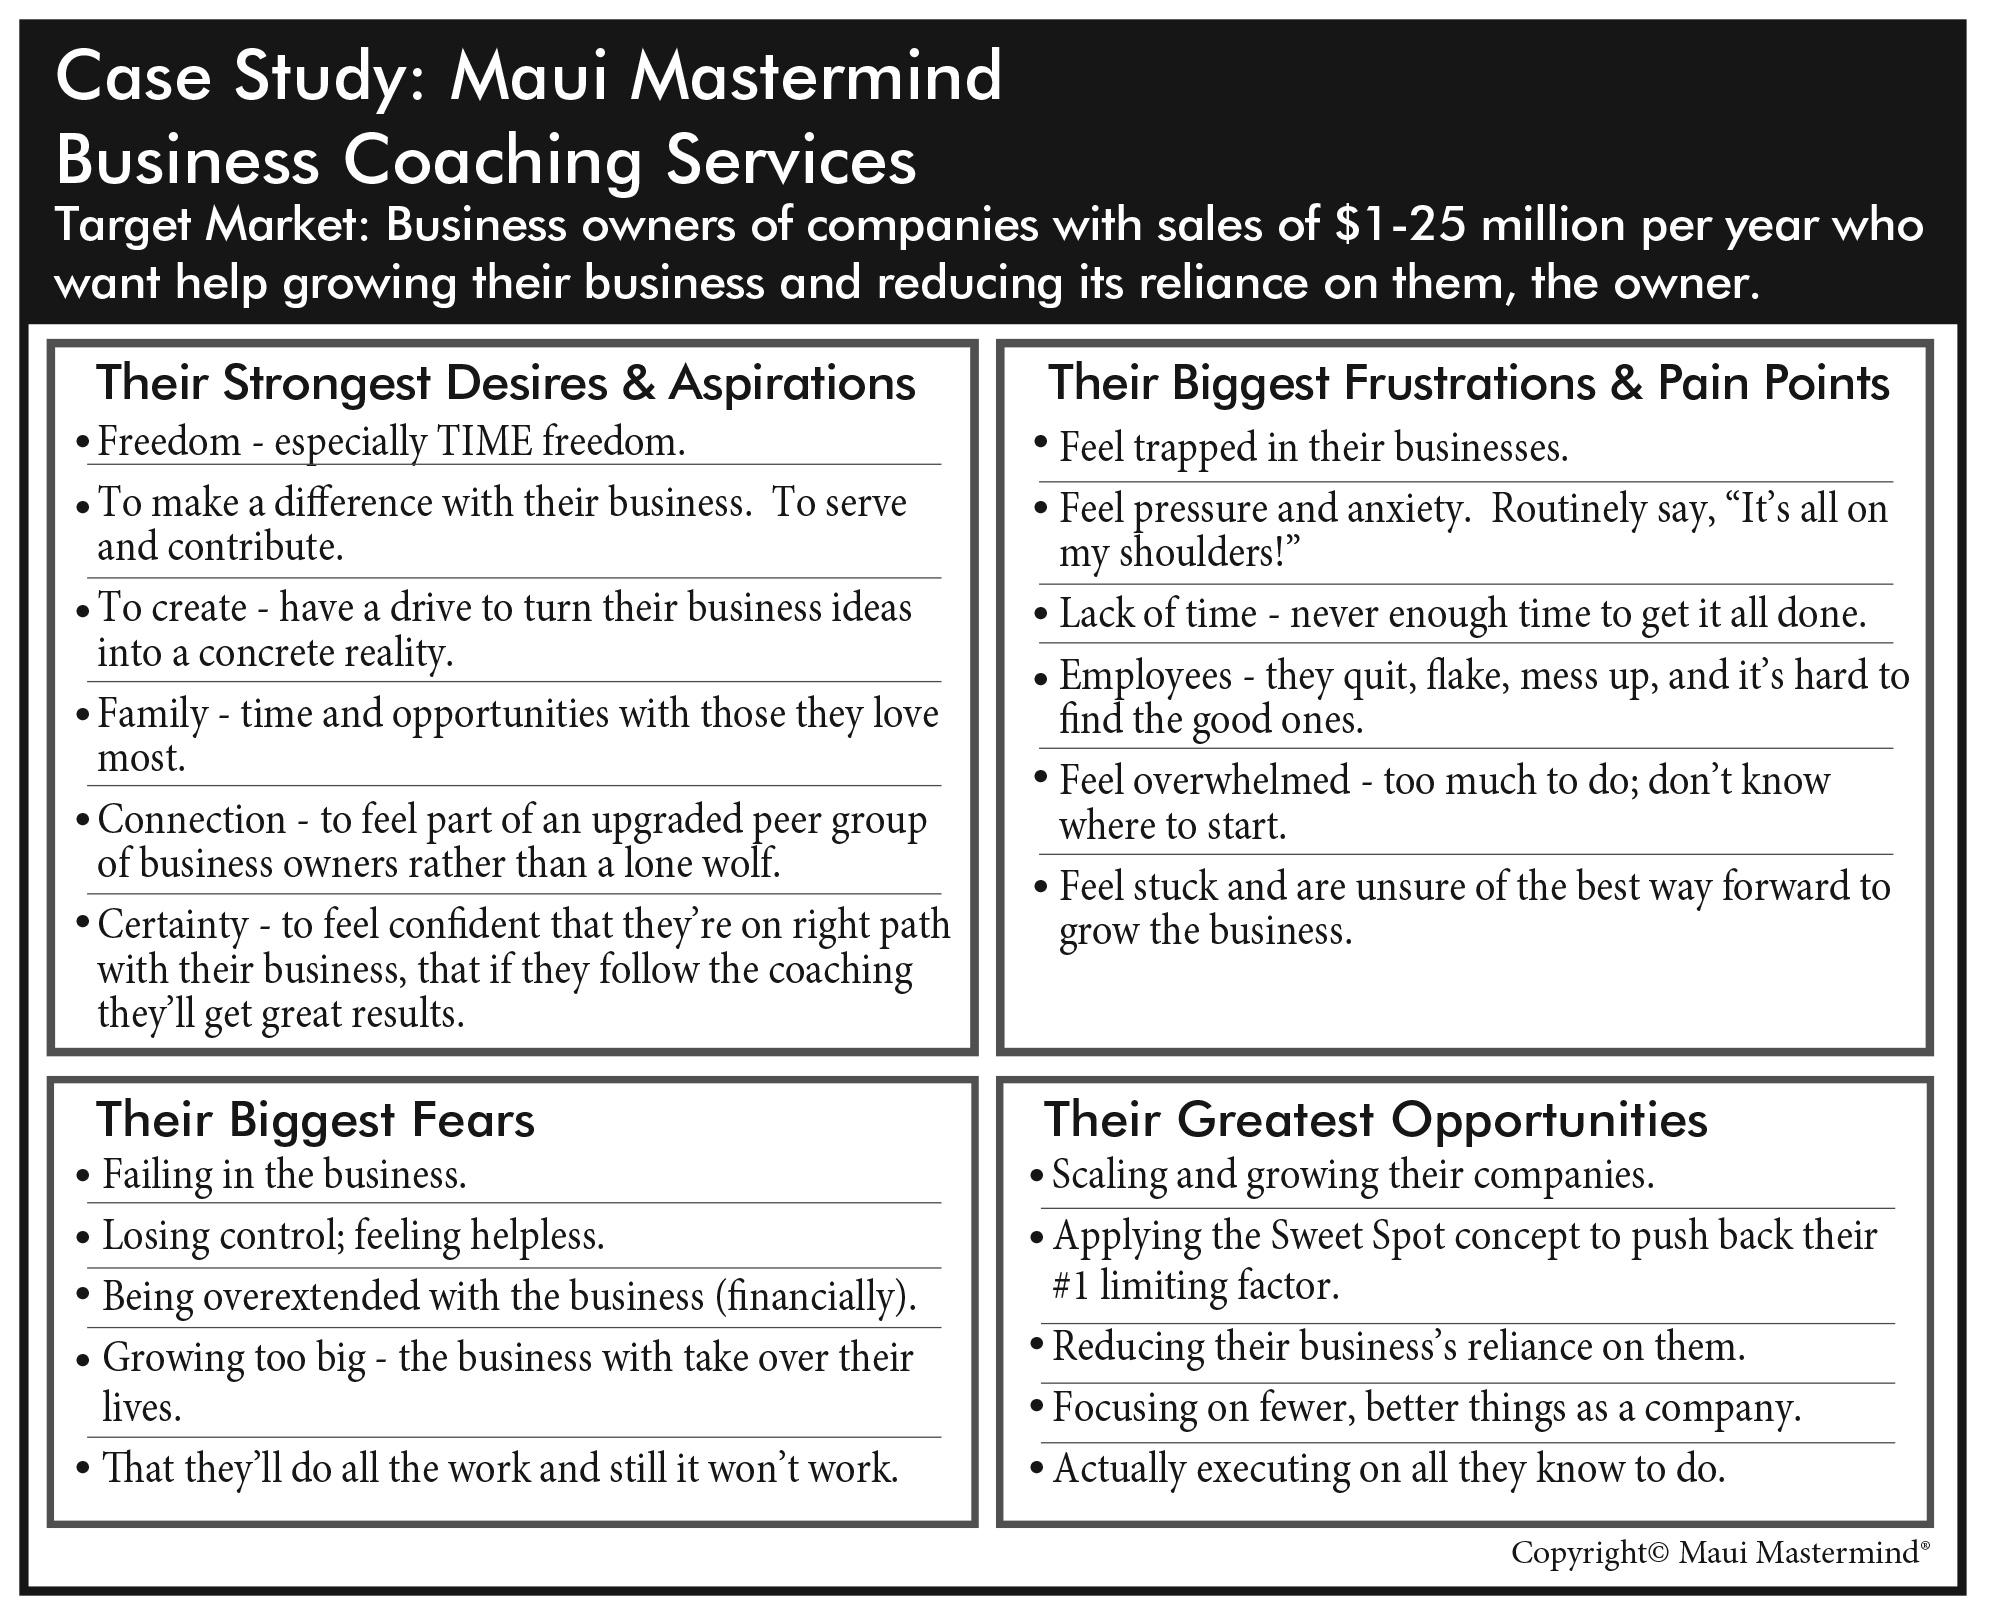 Case Study: Maui Mastermind